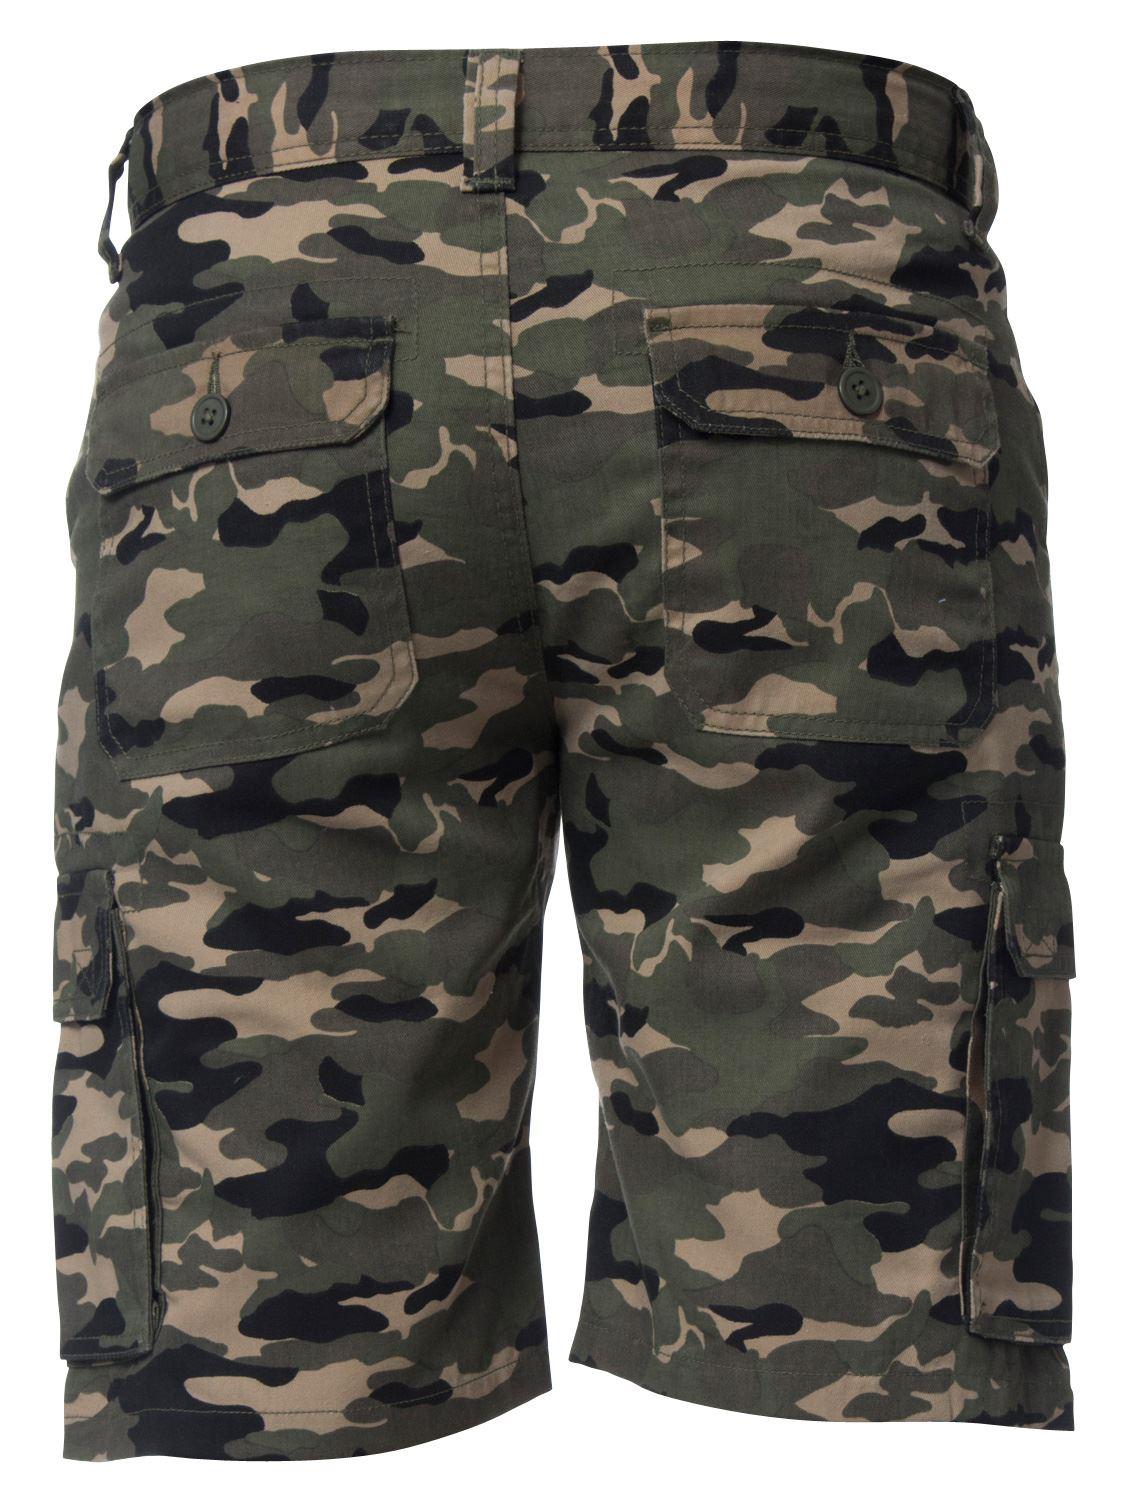 Kruze-Jeans-para-Hombre-Pantalones-Cortos-Combate-del-ejercito-camuflaje-Camo-Trabajo-Shorts miniatura 13